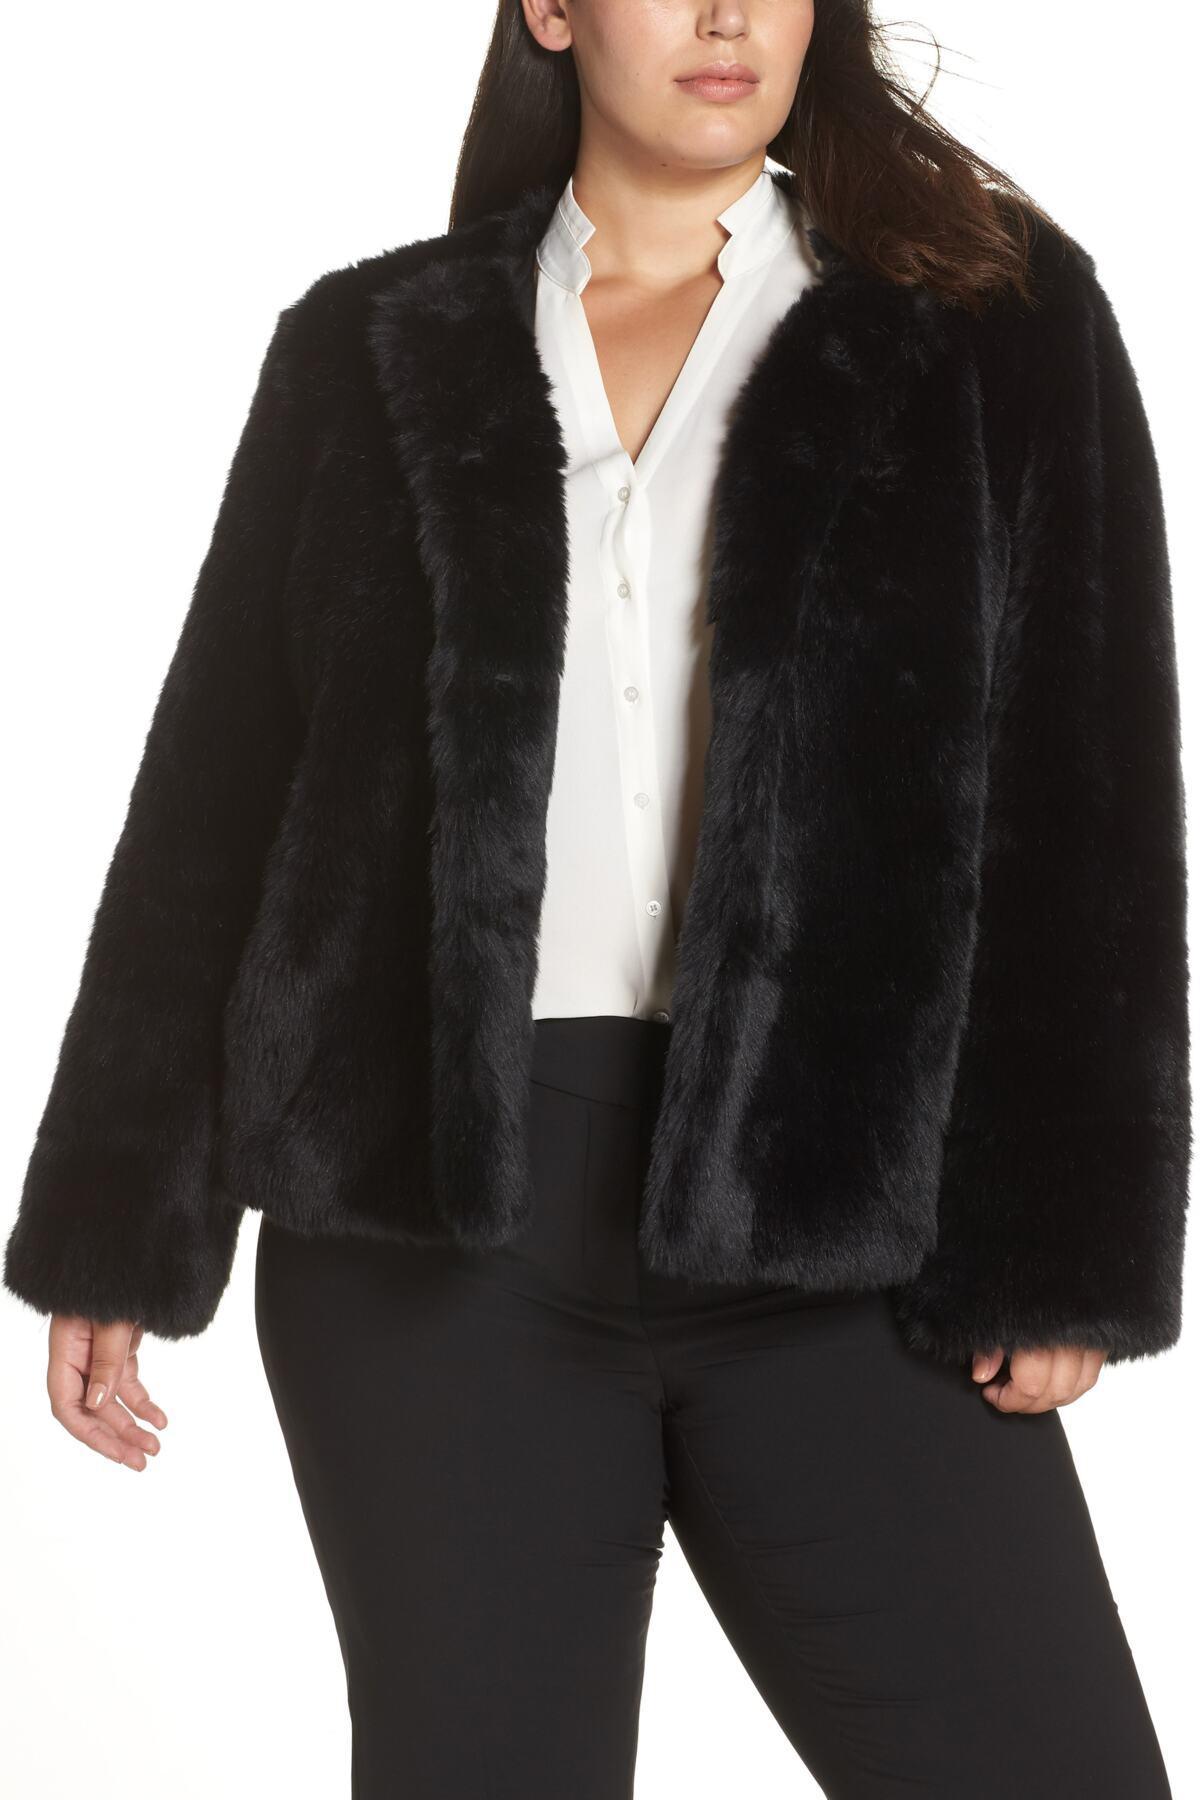 Kess InHouse Heidi Jennings Love is in The Air Pink Fleece Throw Blanket 40 x 30